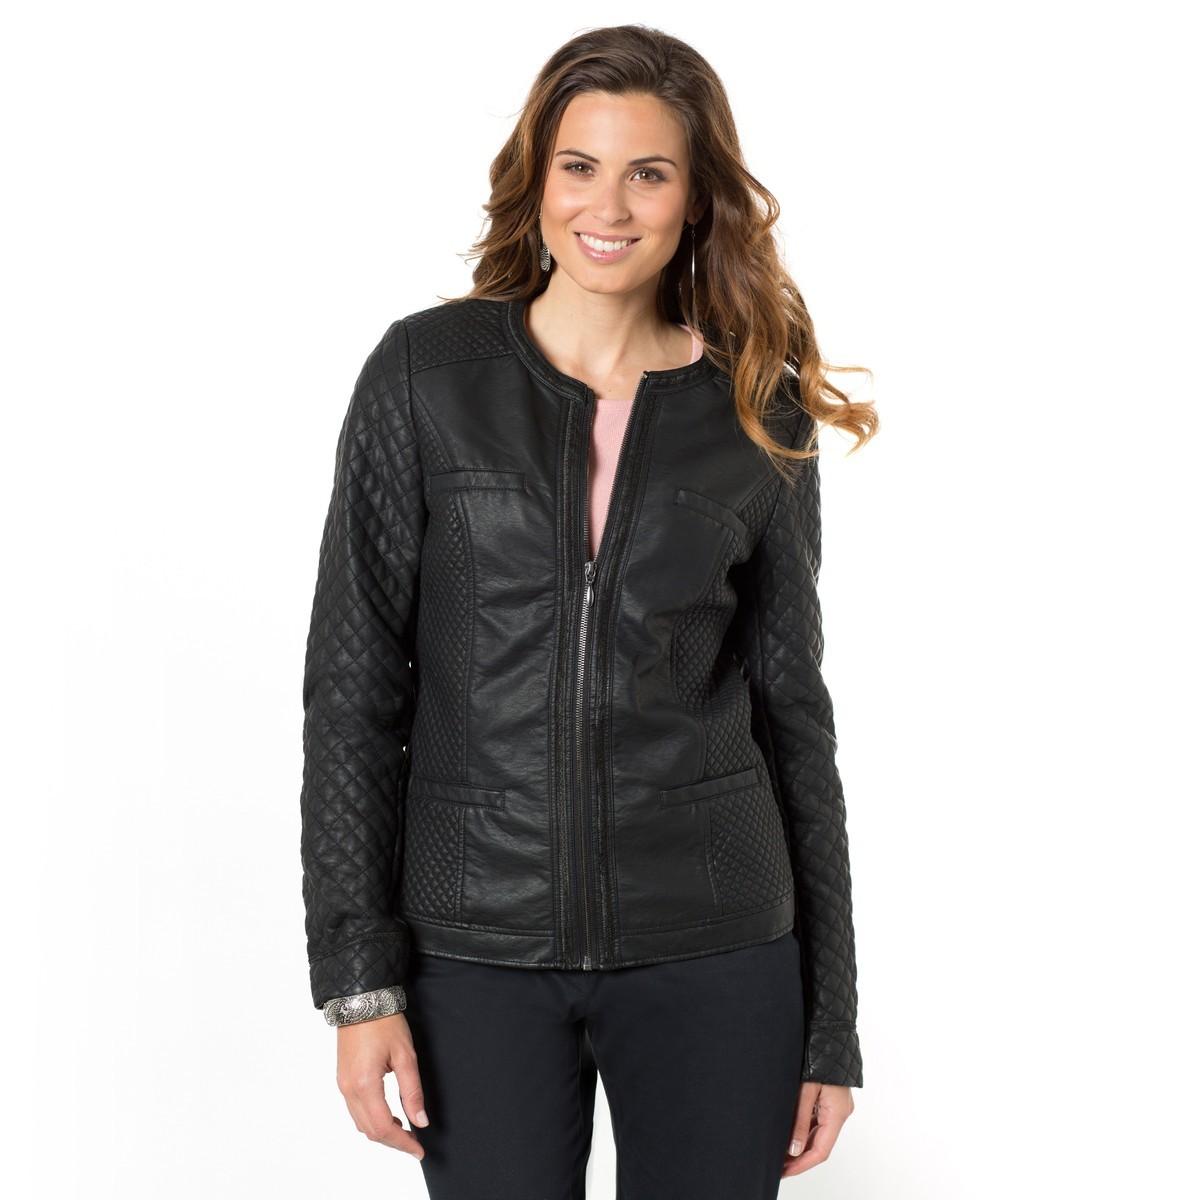 New Stylish Quilted Crew Neck Women's Genuine Leather Biker Jacket